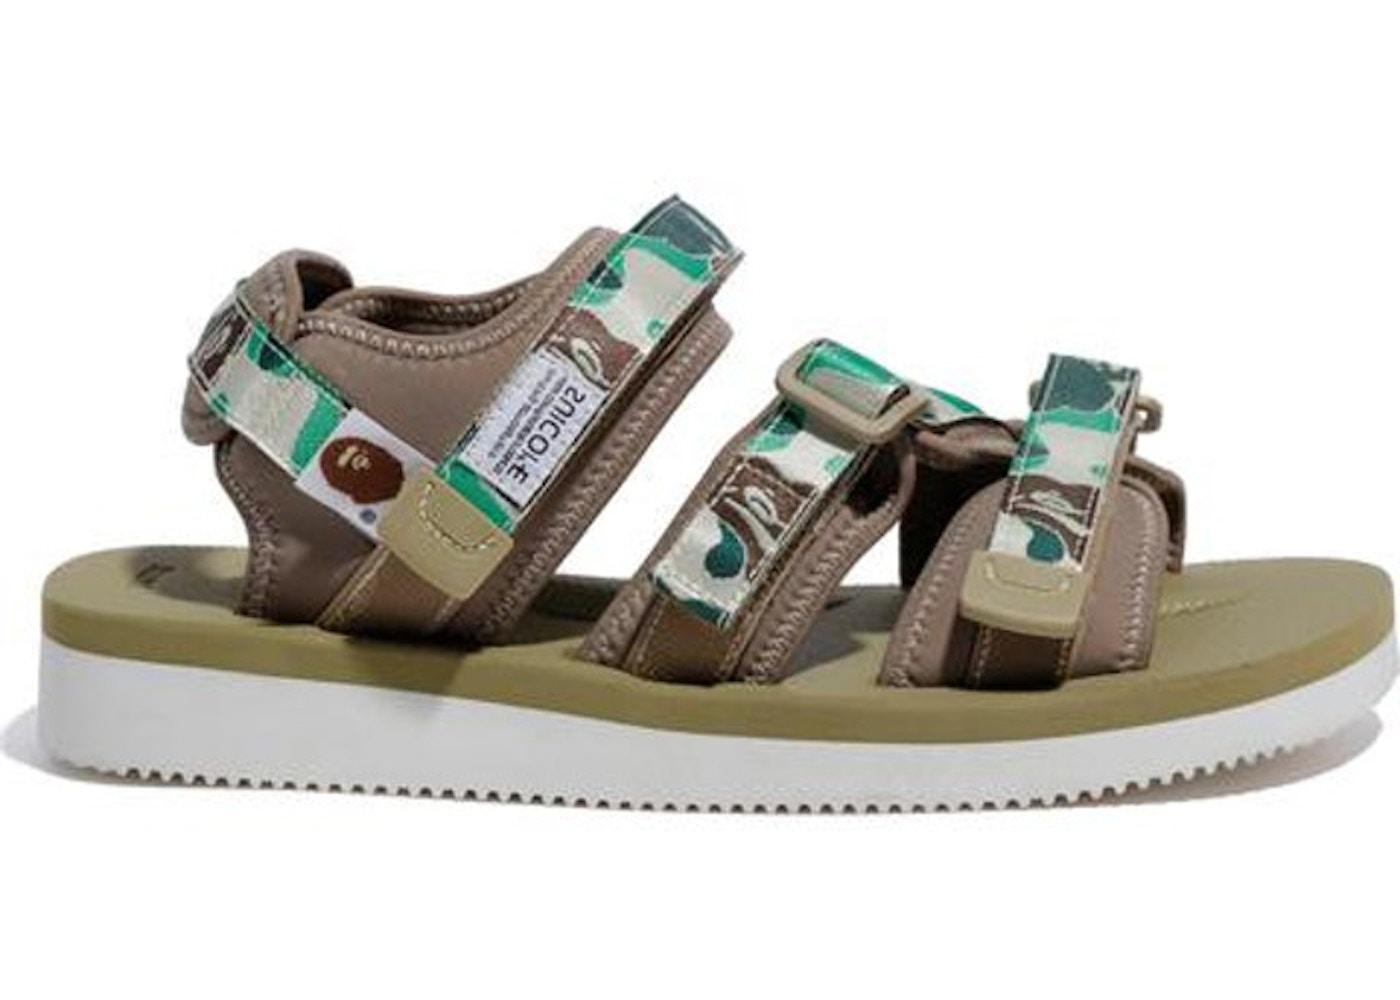 dc562102 Suicoke x Bape ABC Kisee-2APE (W) - Sneakers